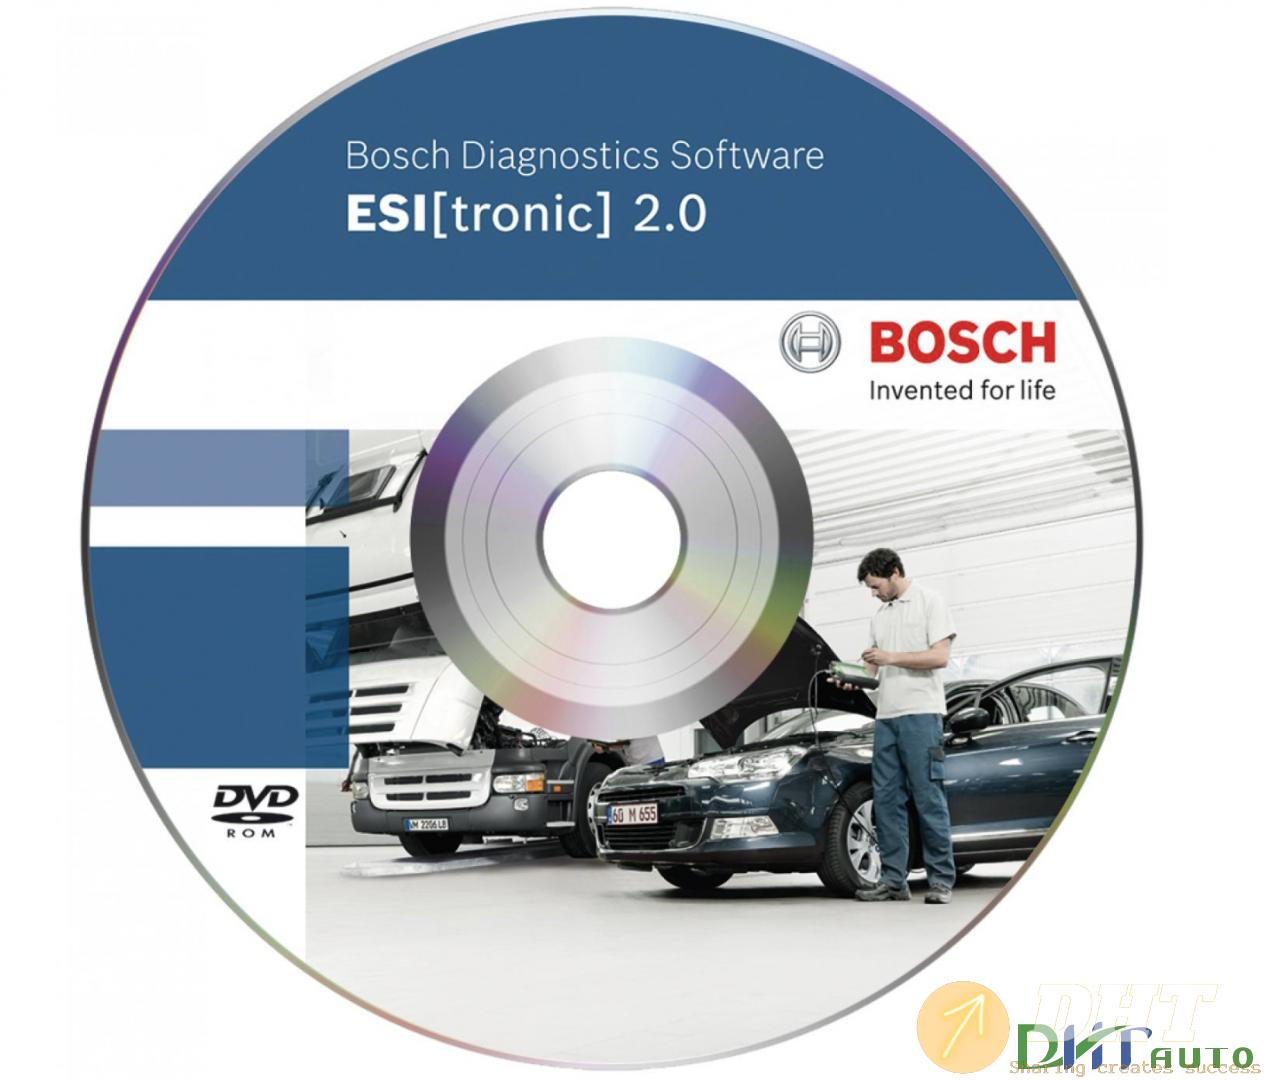 Bosch-ESI-tronic-2.0-Full-01-2018-1.png